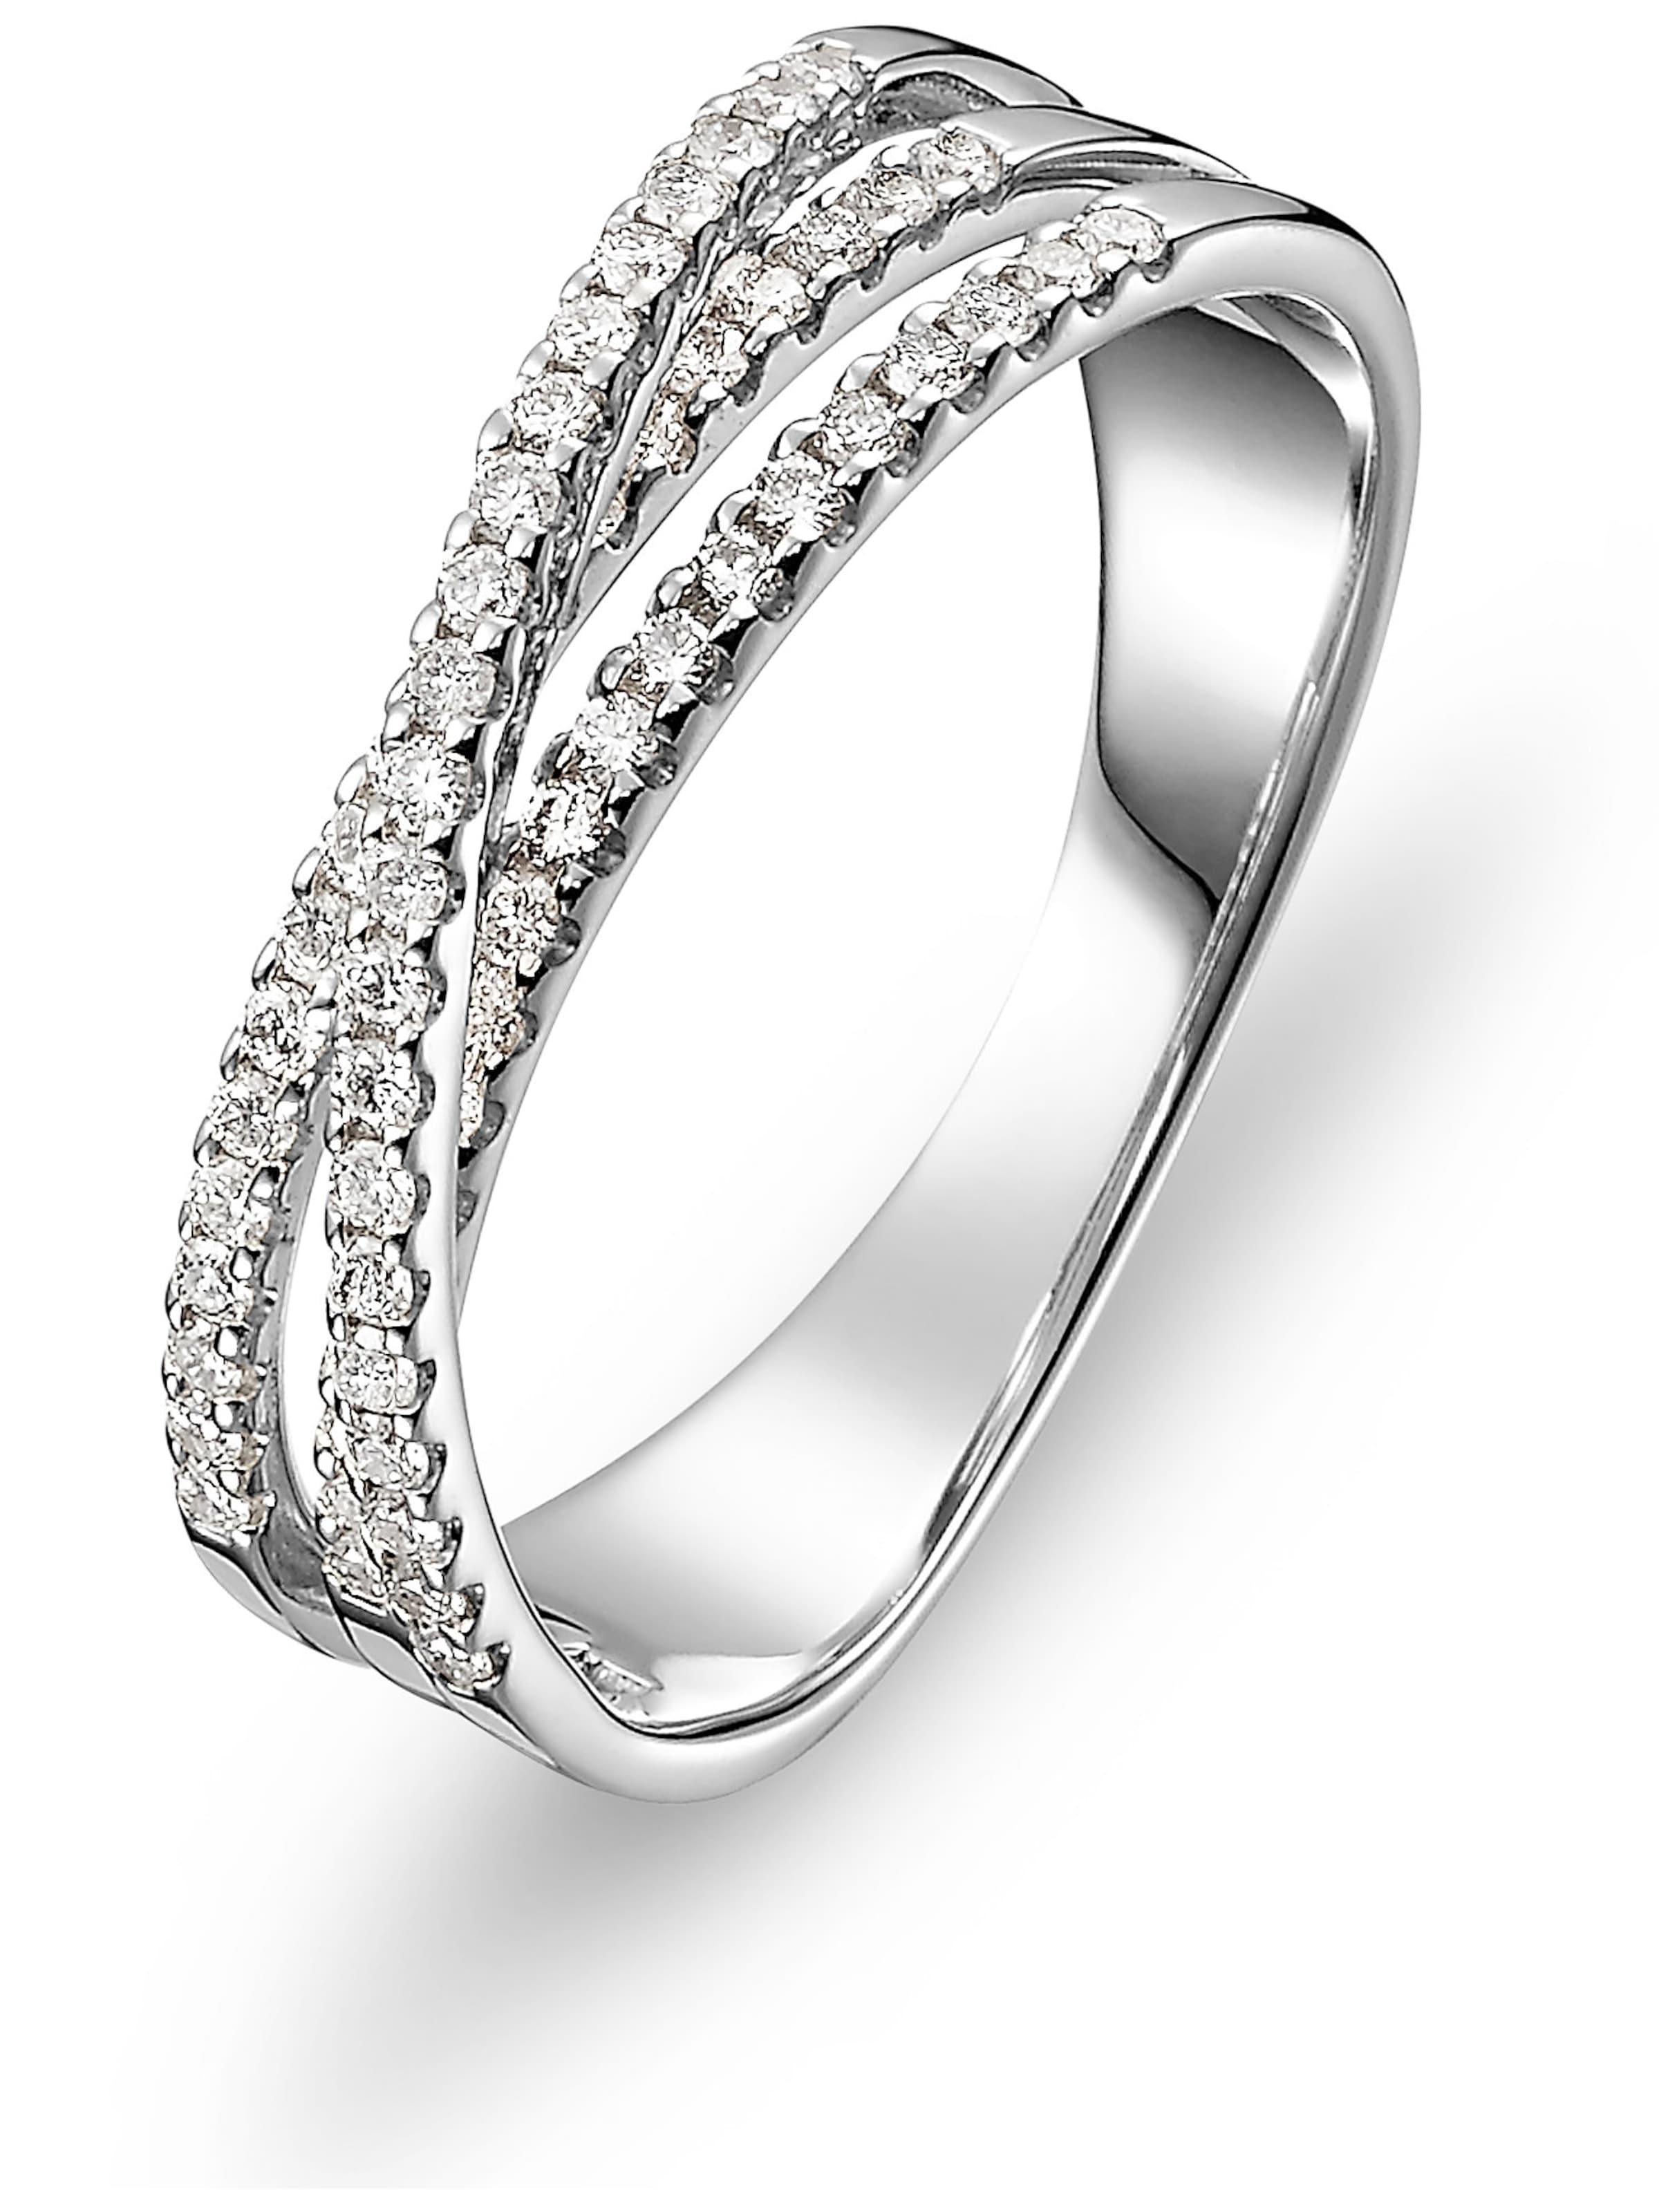 SilberWeiß 'diamonds' In Christ Ring 'diamonds' Christ Christ Ring SilberWeiß Ring In 5TFcKJ3lu1